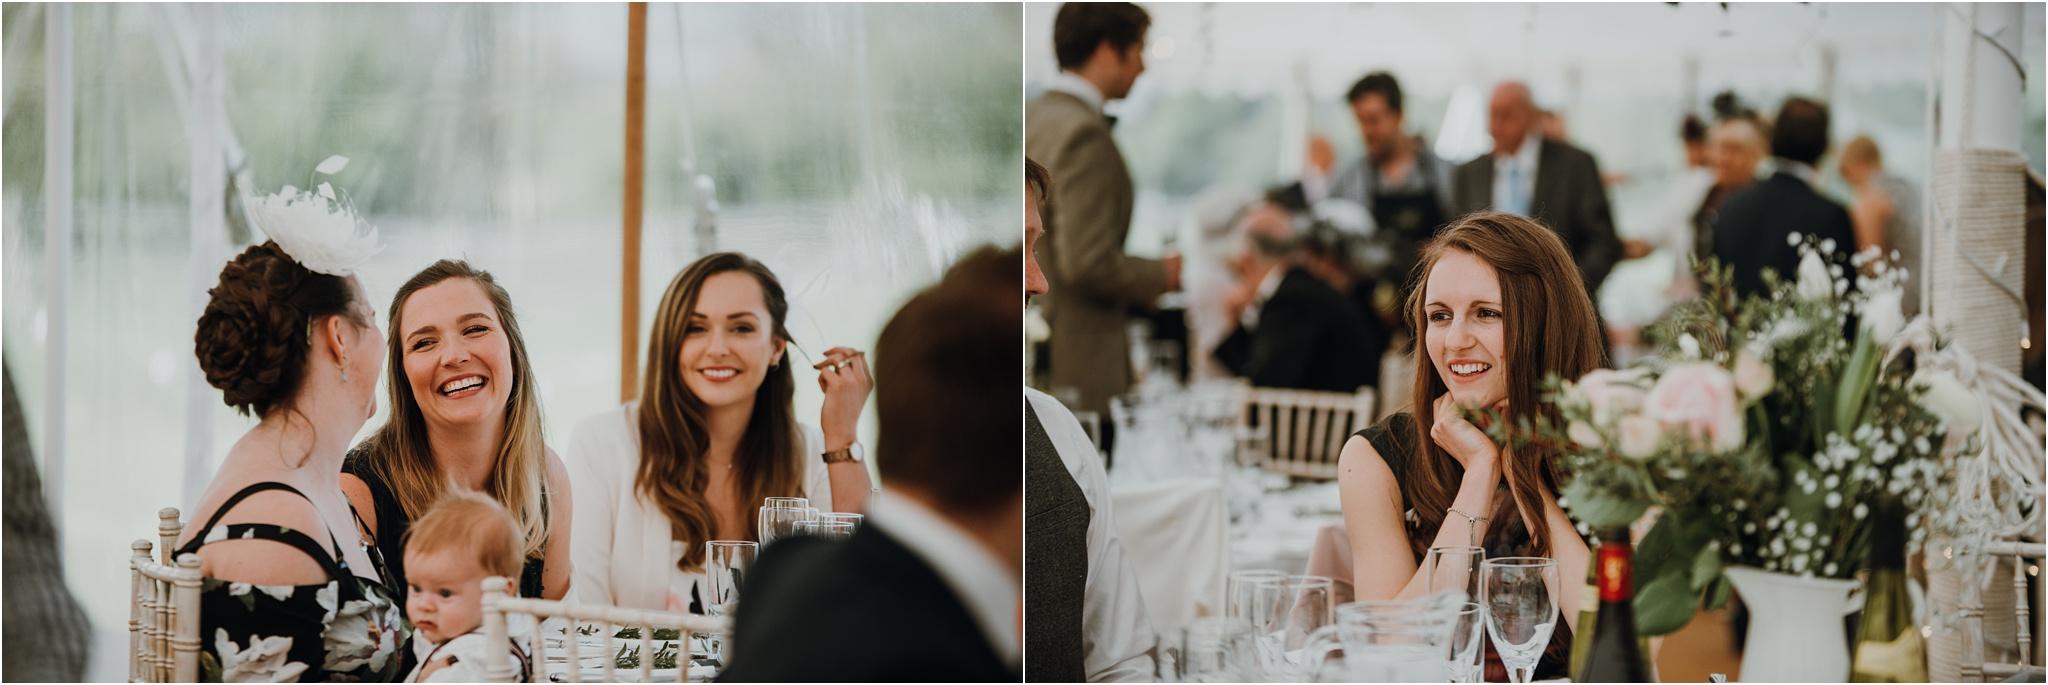 Outdoor-country-wedding-Edinburgh-photographer__0114.jpg